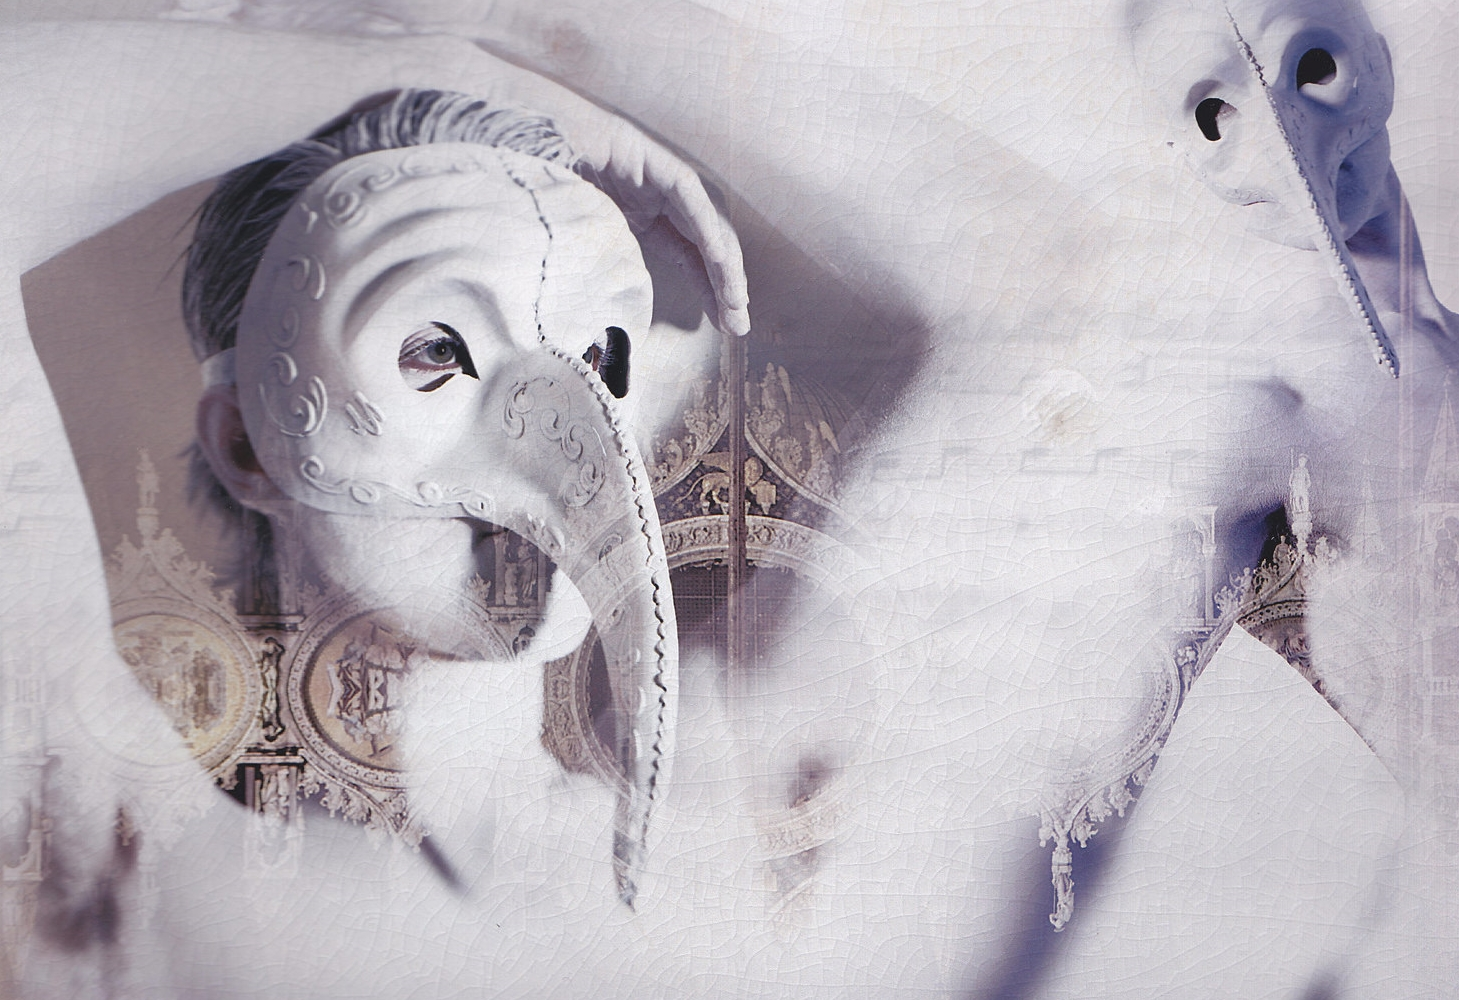 mask image.jpg